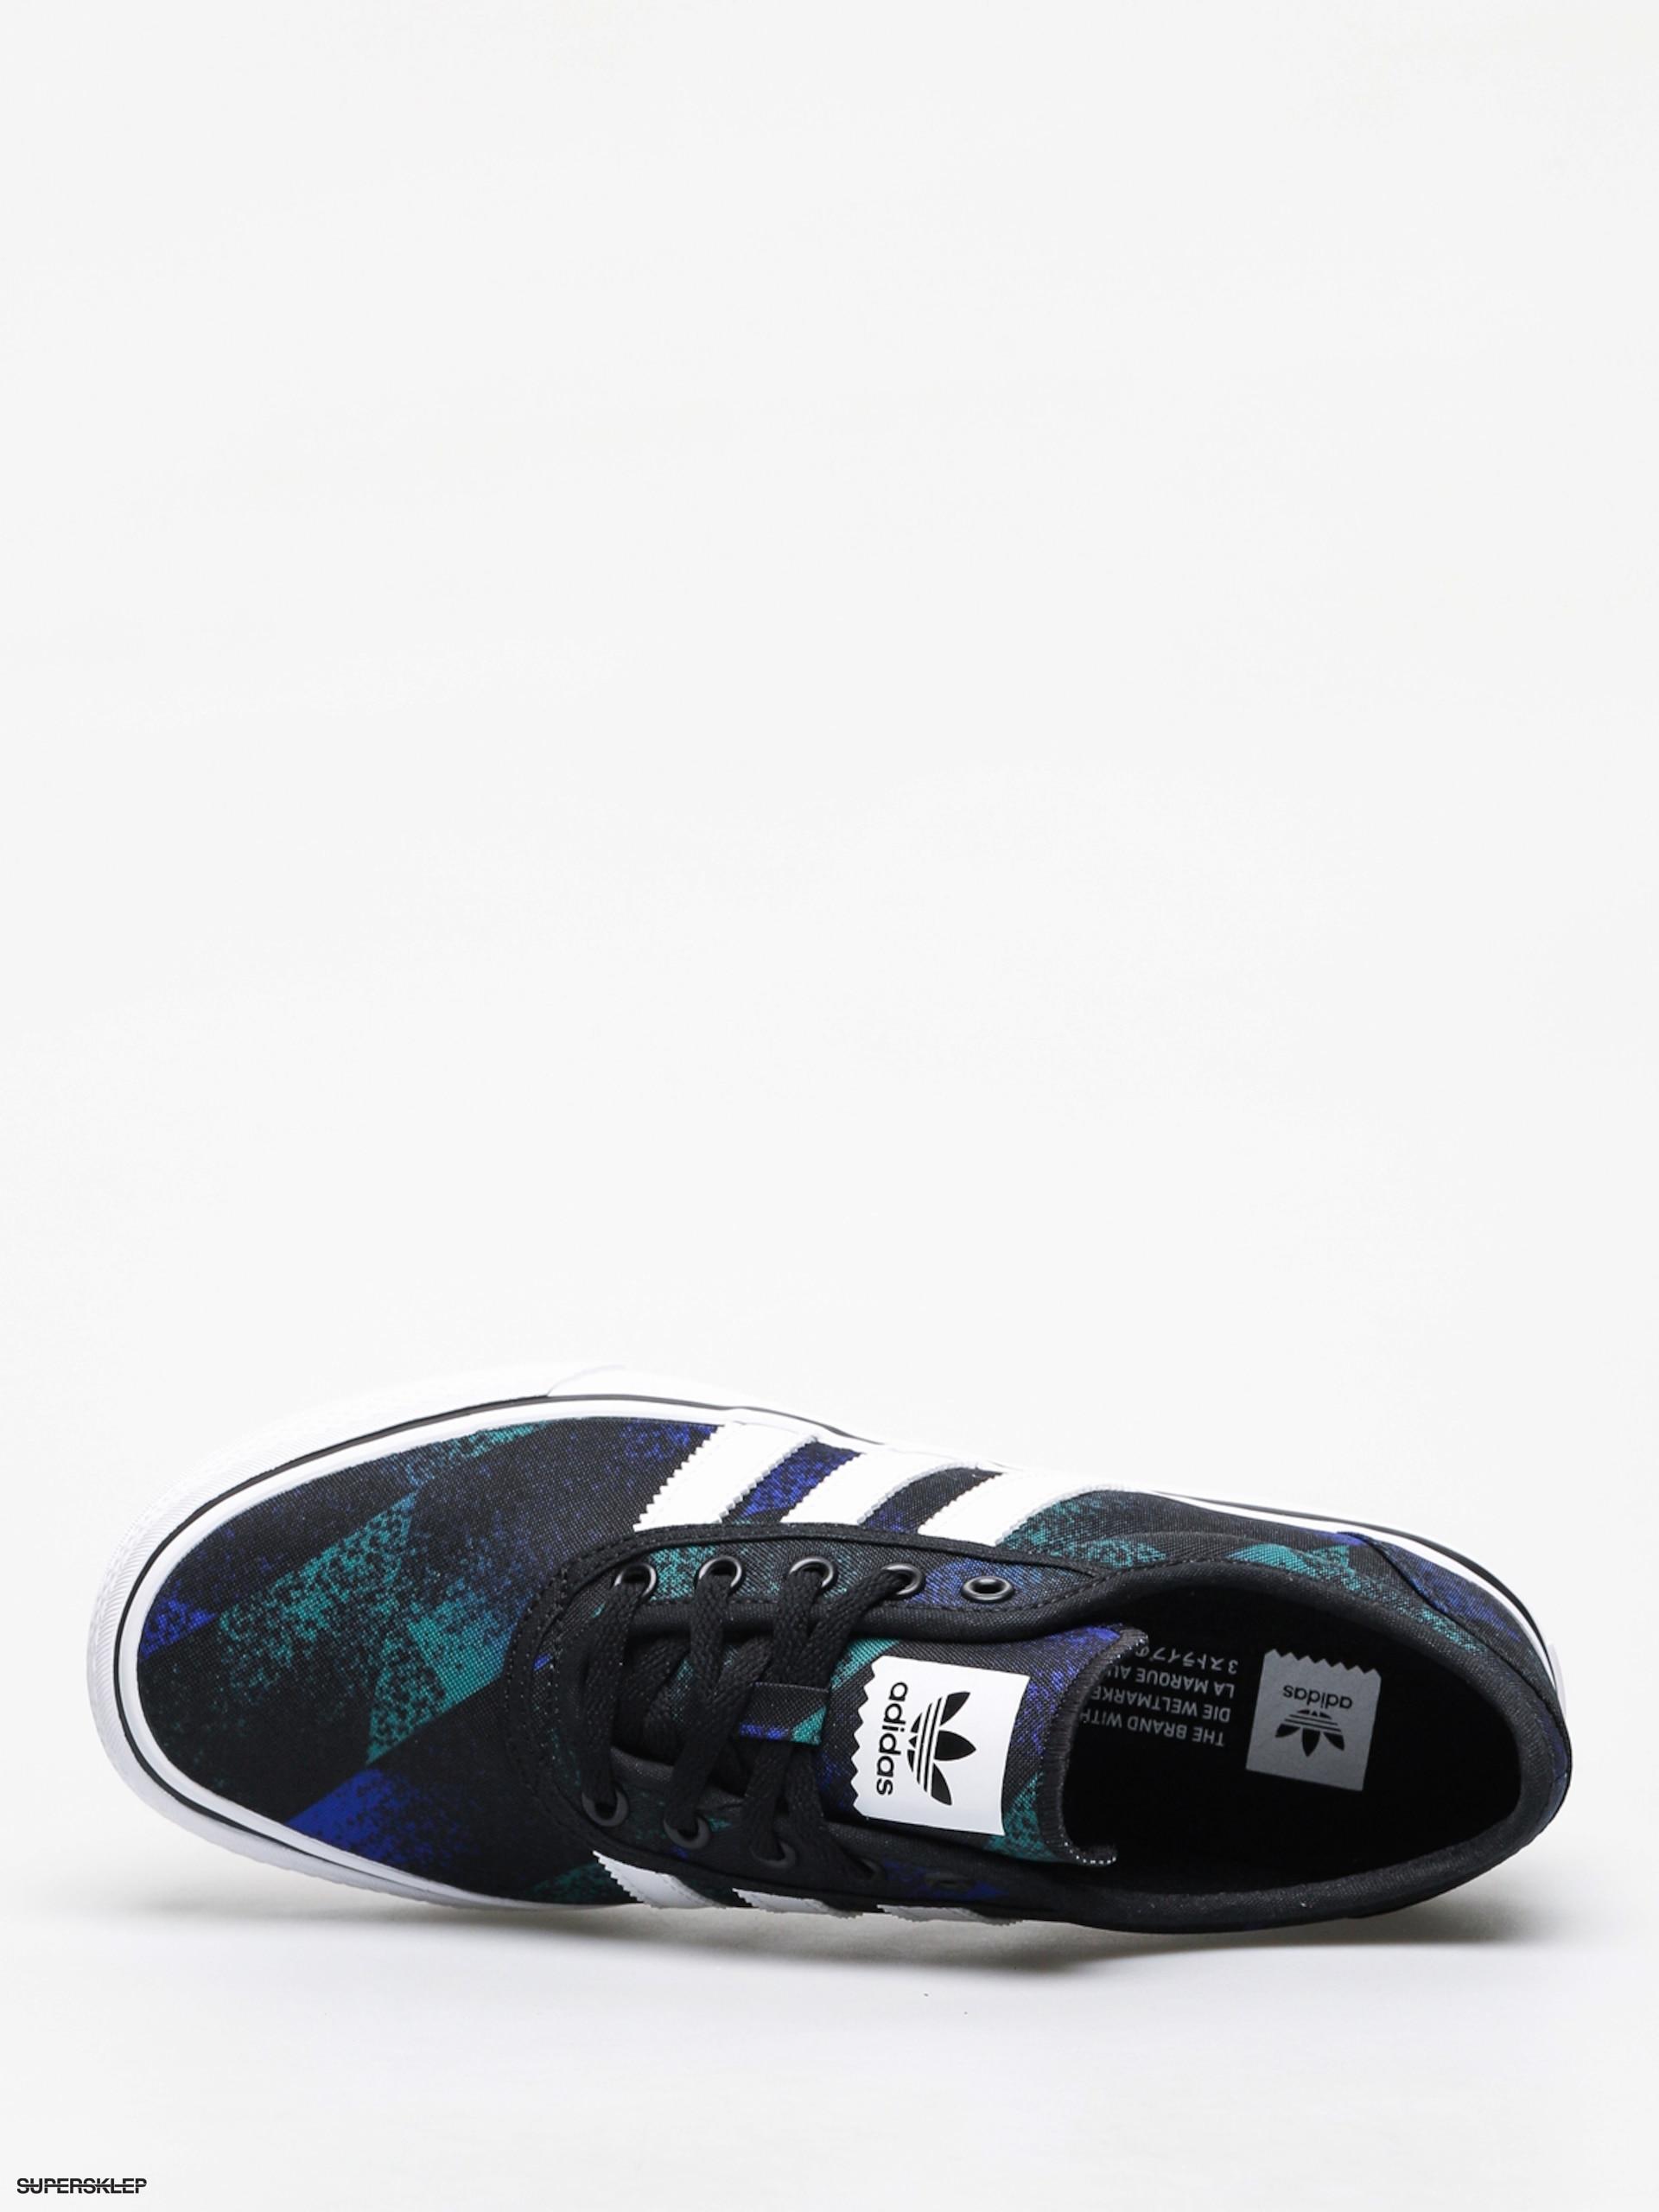 53e490f7f0710 Topánky adidas Adi Ease (cblack/ftwwht/gum4)